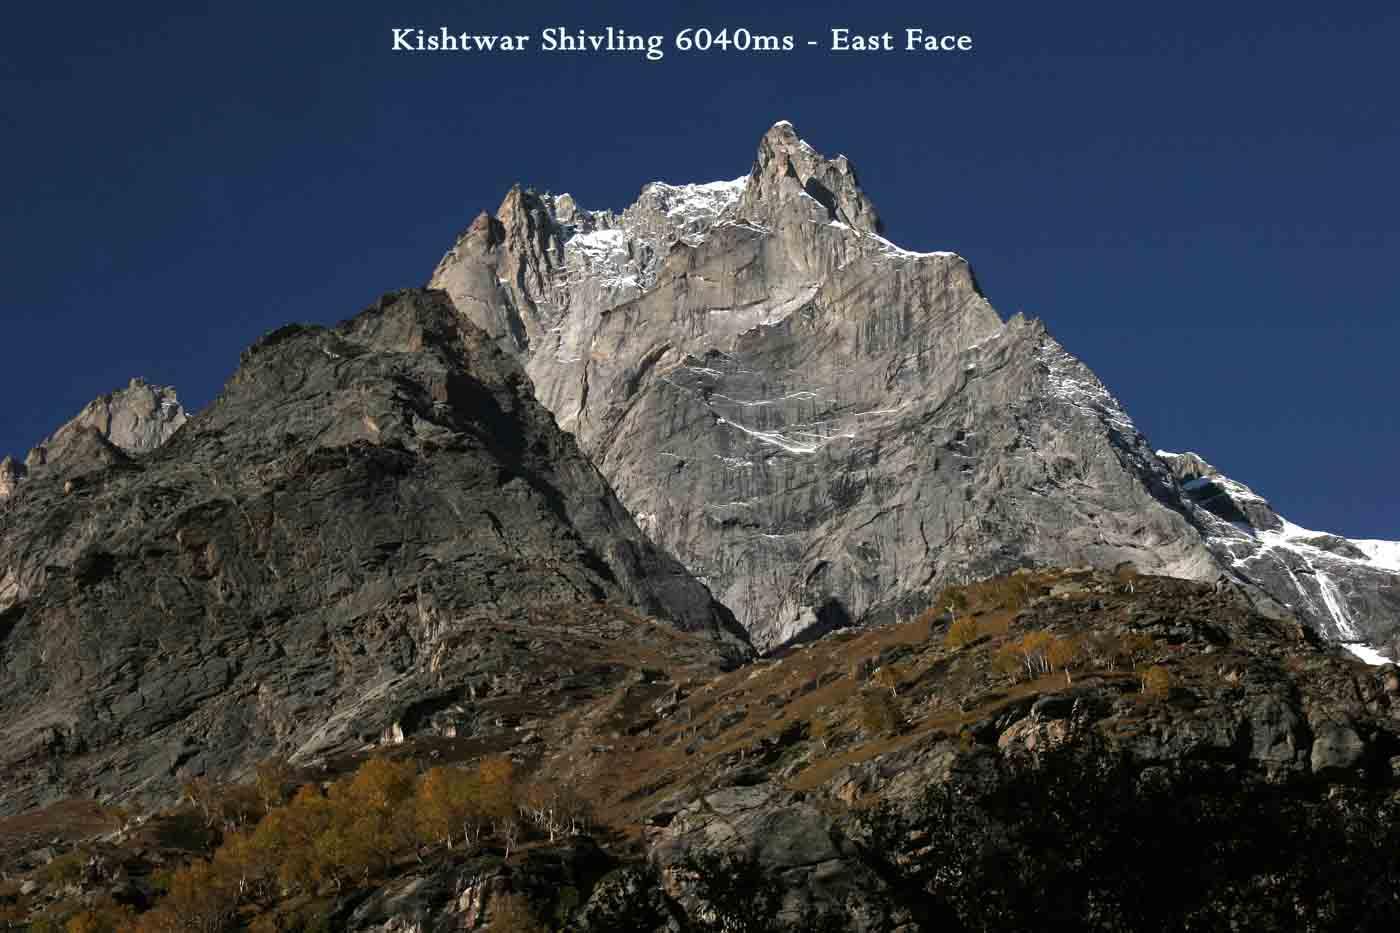 Kishtwar Shivling